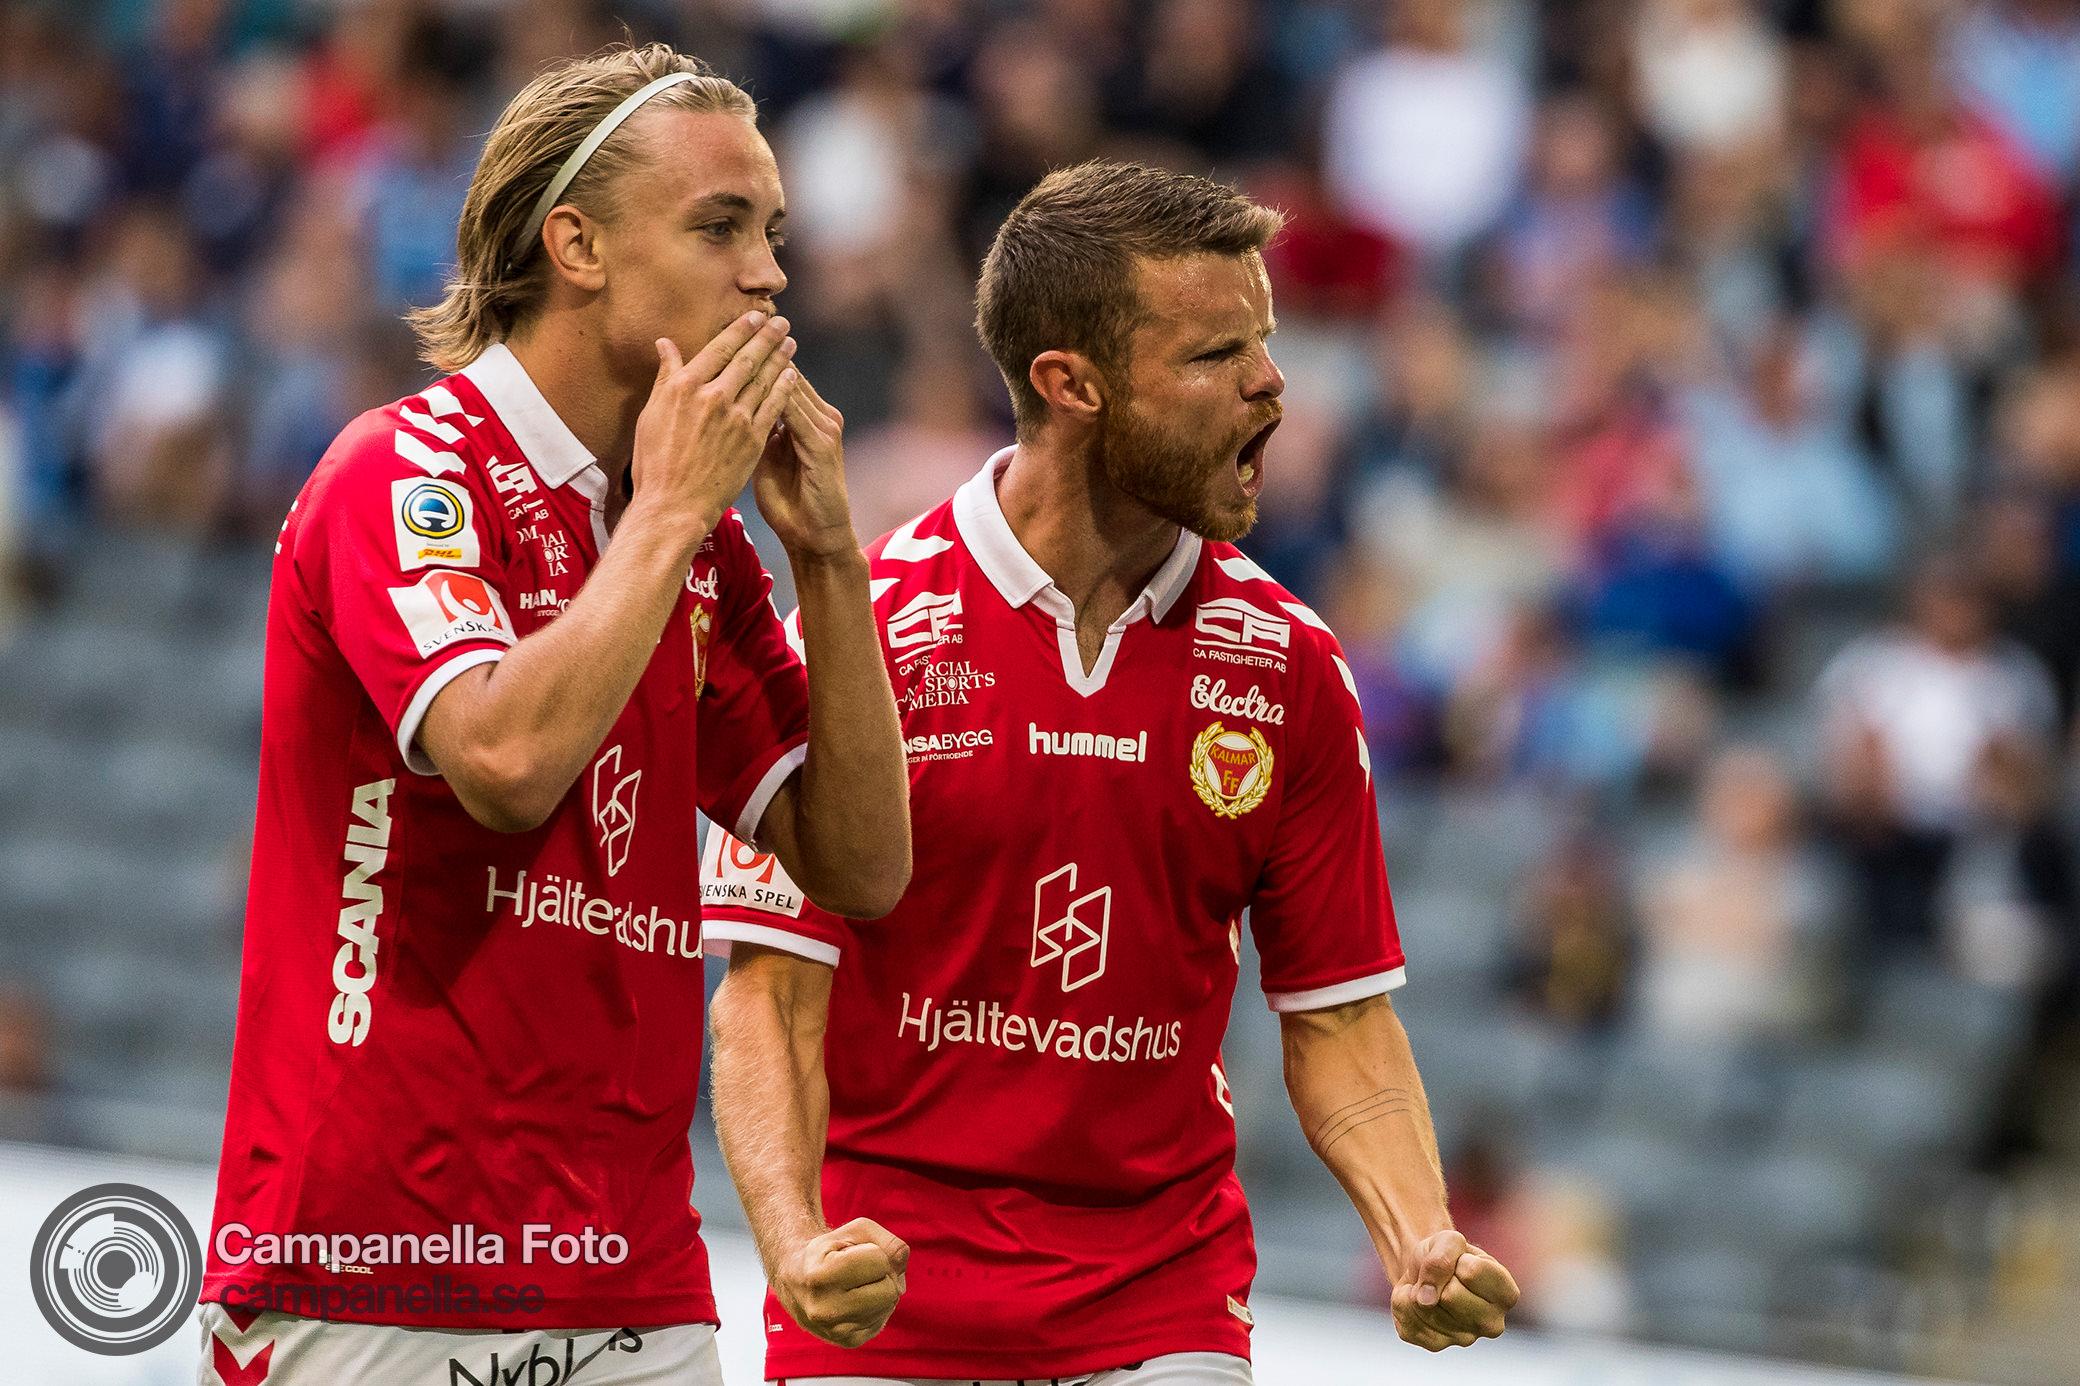 Djurgårdens IF 0 - 2 Kalmar FF (2018-08-19) - Michael Campanella Photography